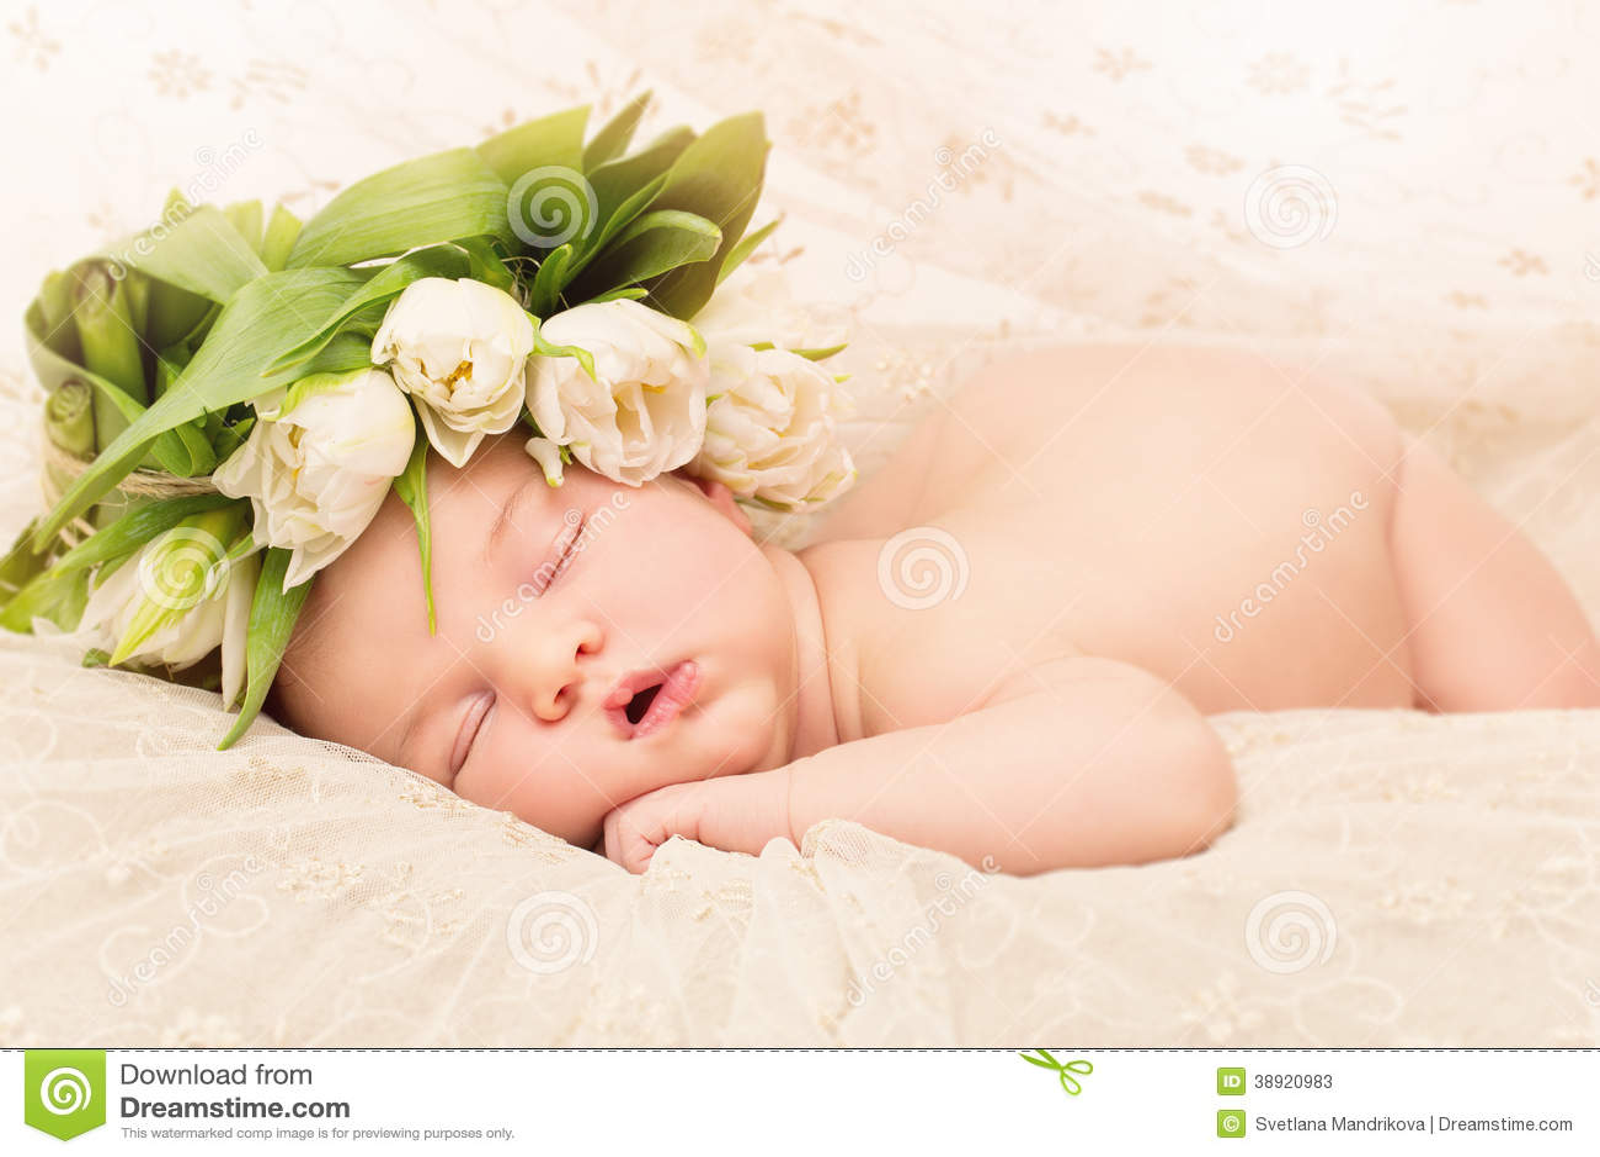 Newborn baby with flowers stock image. Image of children ...